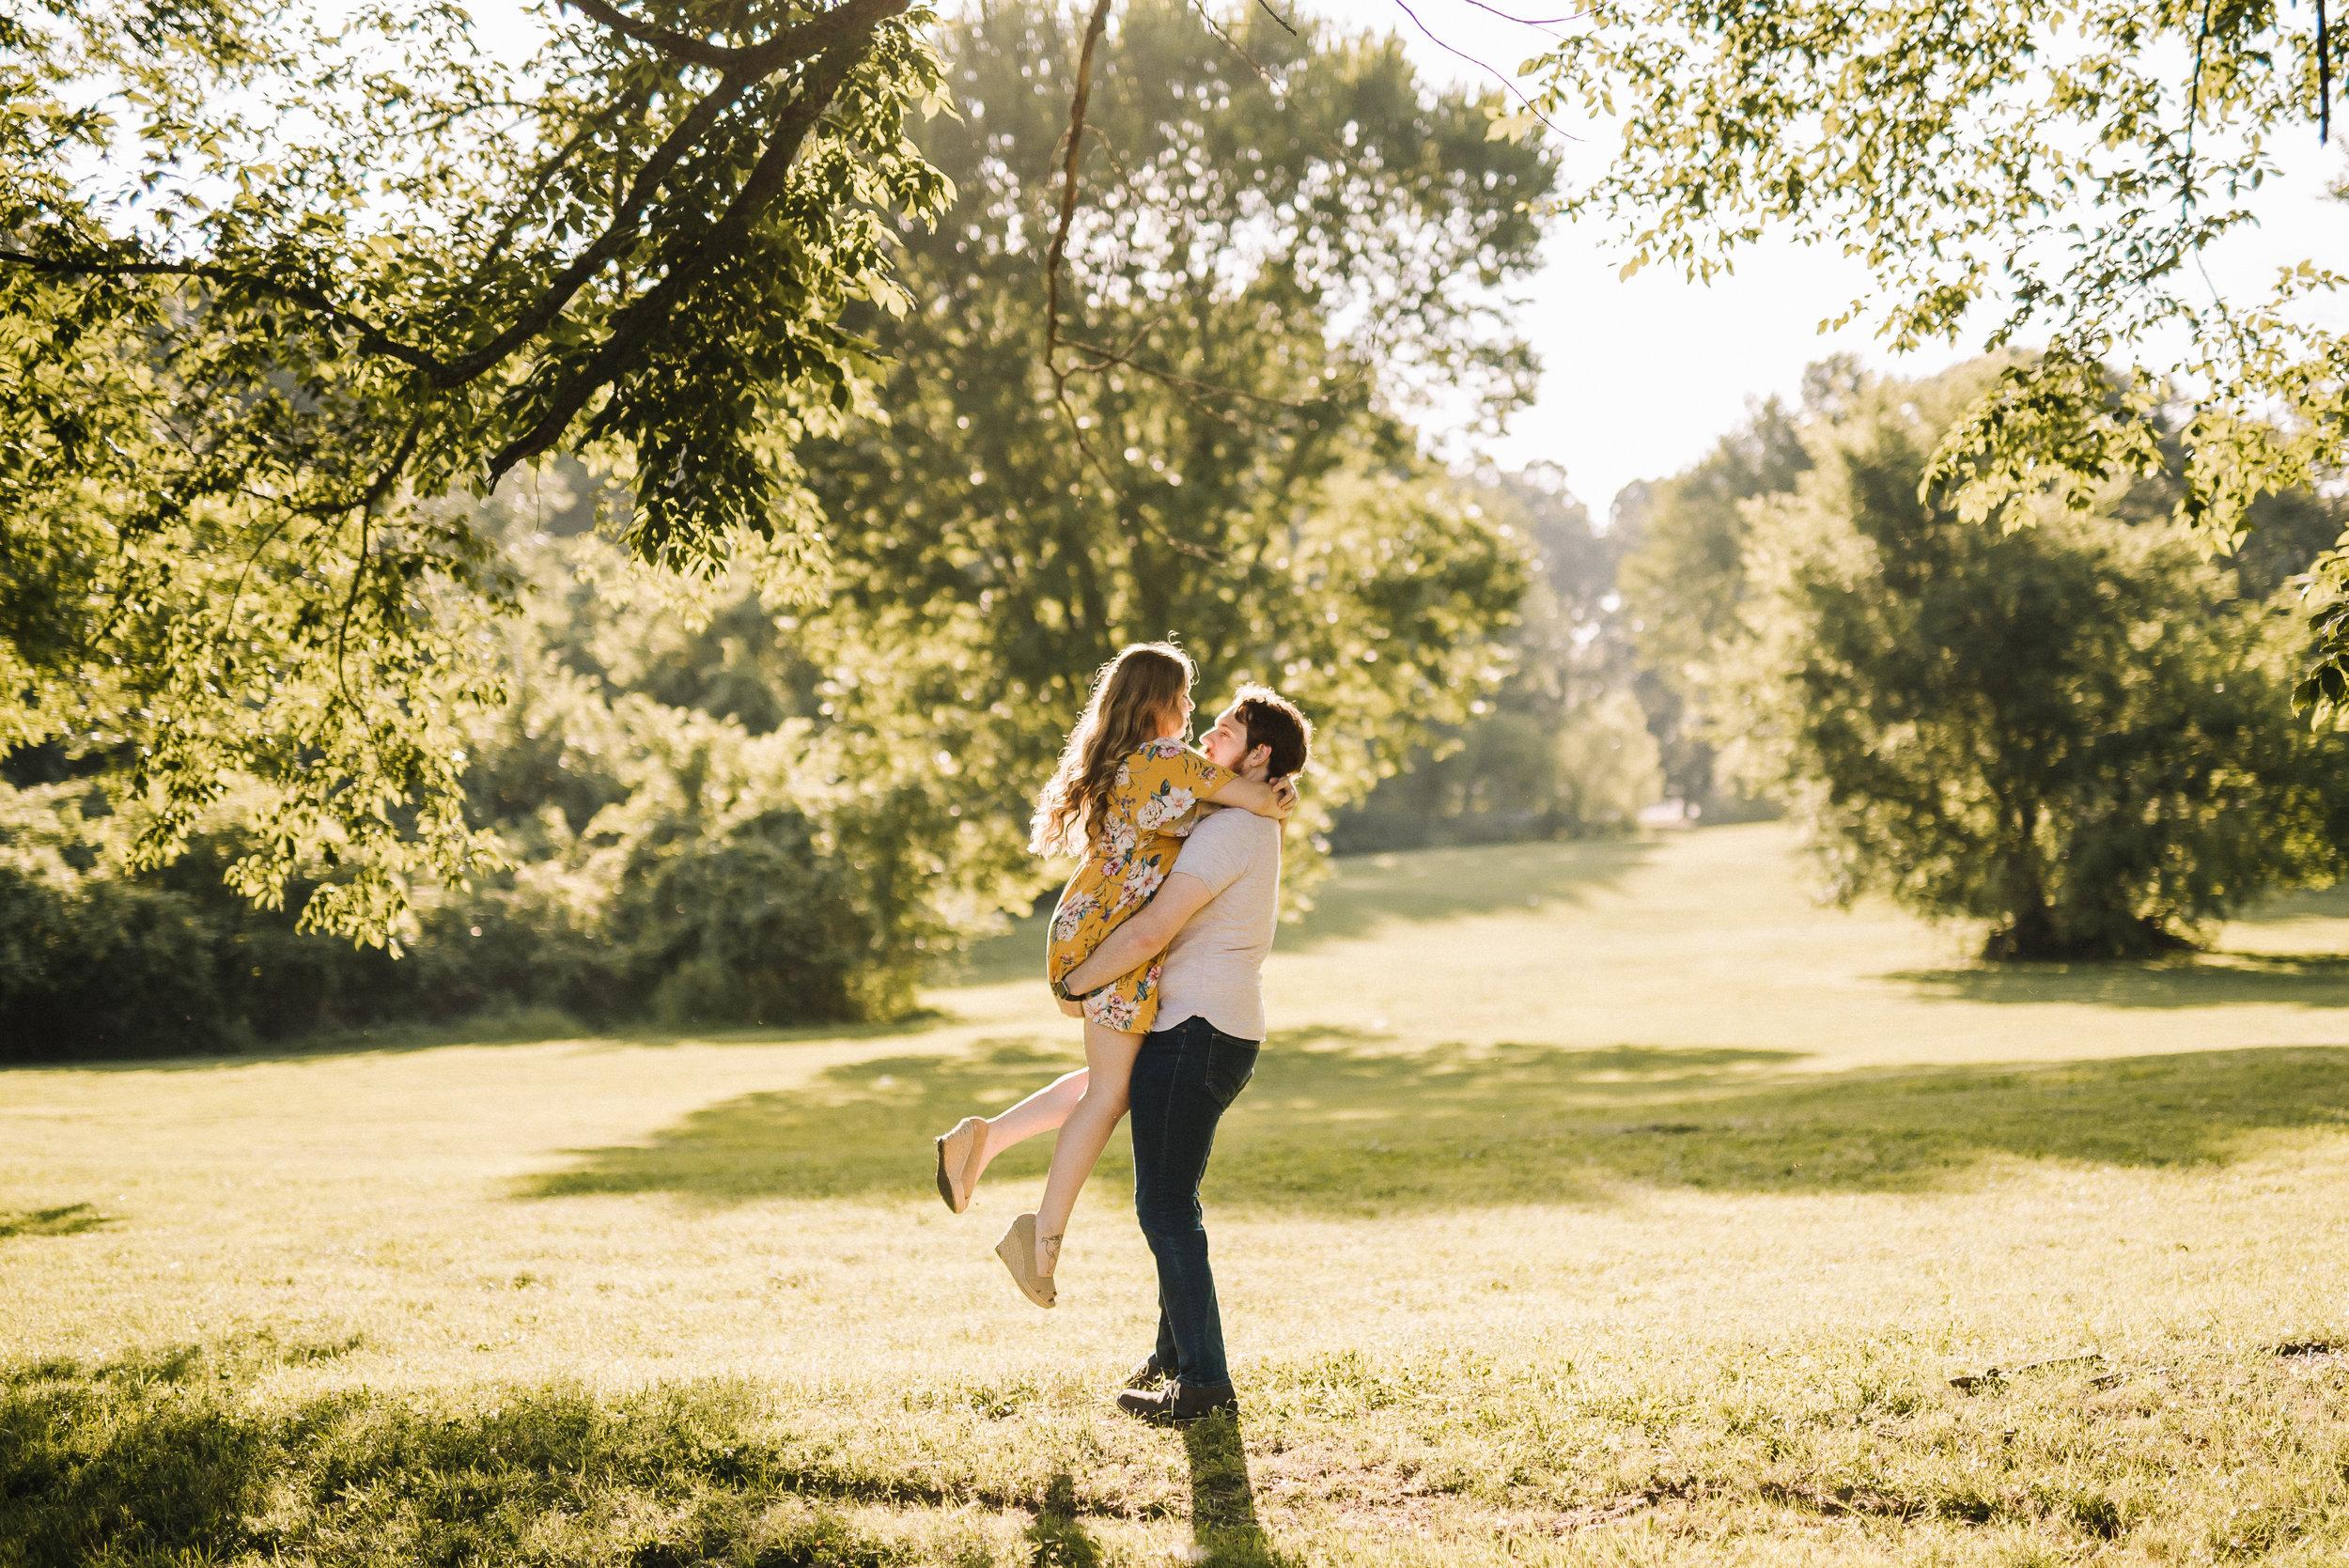 Maddie & Ryan_Shelby Farms_Martyrs Park_Ashley Benham Photography-9.jpg